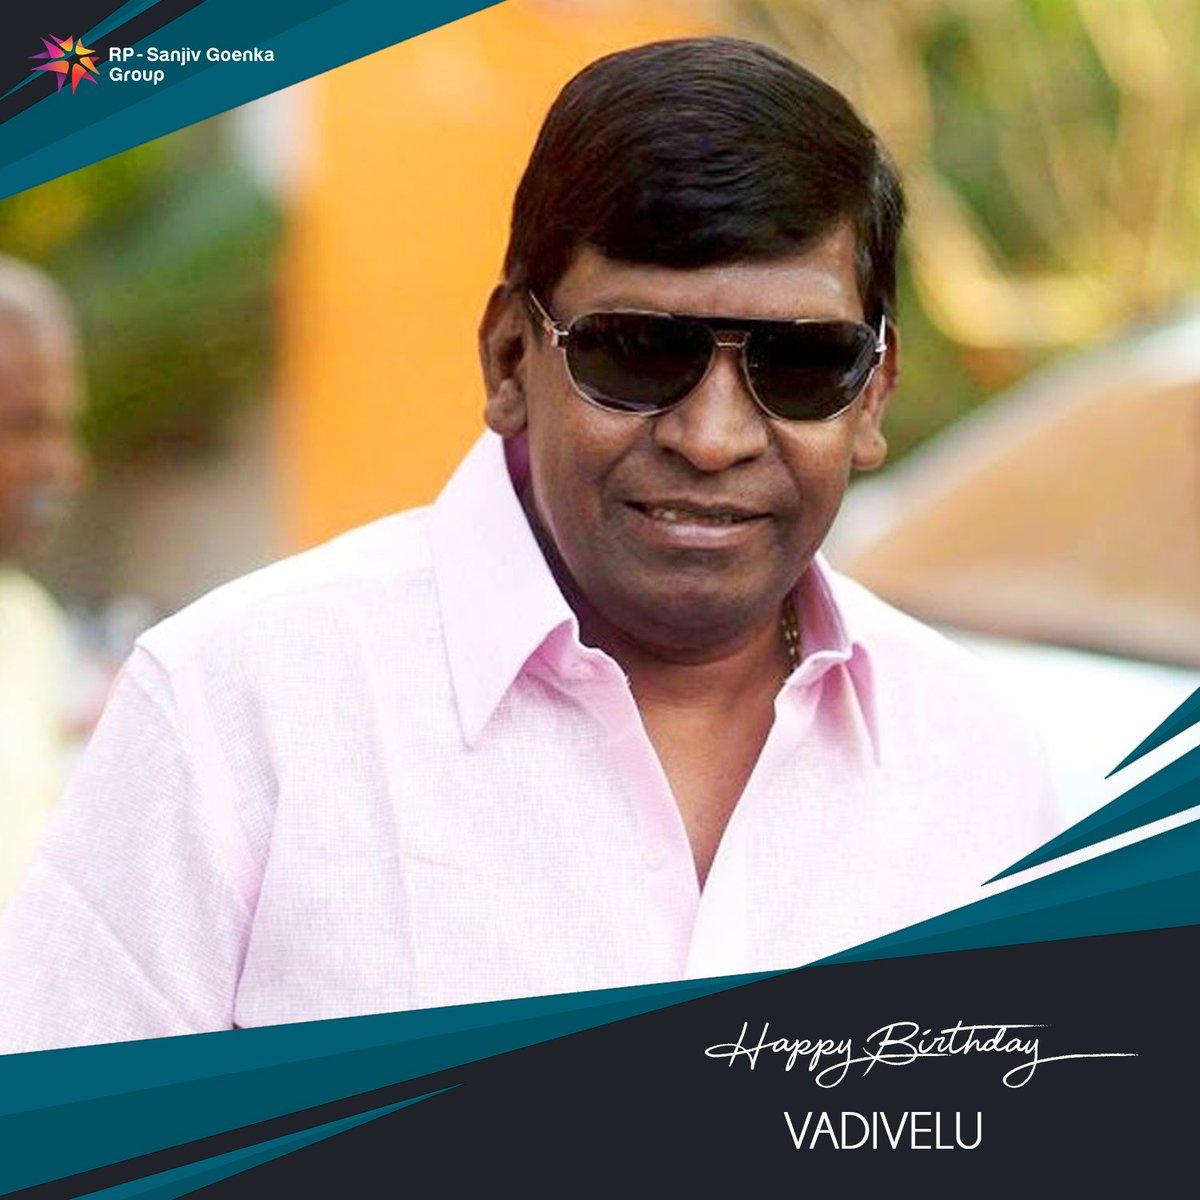 Birthday wishes to #VaigaiPuyal Vadivelu   #SaregamaWishes #HBDVaigaiPuyalVadivelu #HappyBirthdayVaigaiPuyalVadivelu https://t.co/a4qLfx6zka